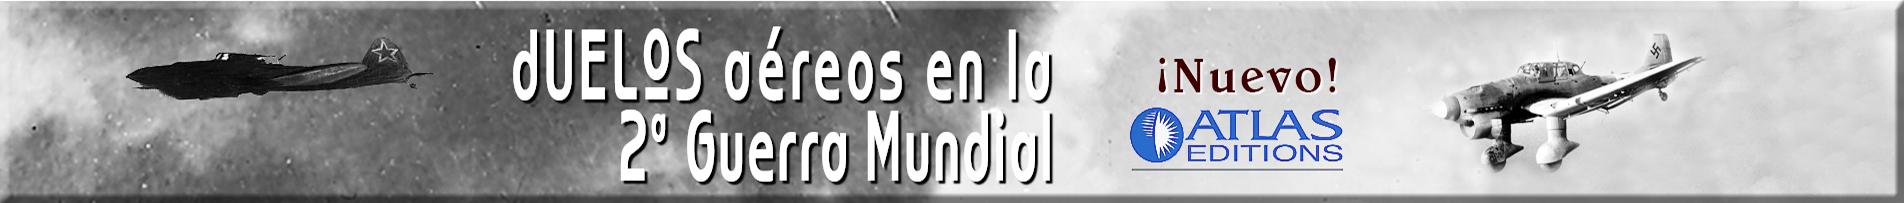 DUELOS_AEREOS_d.jpg